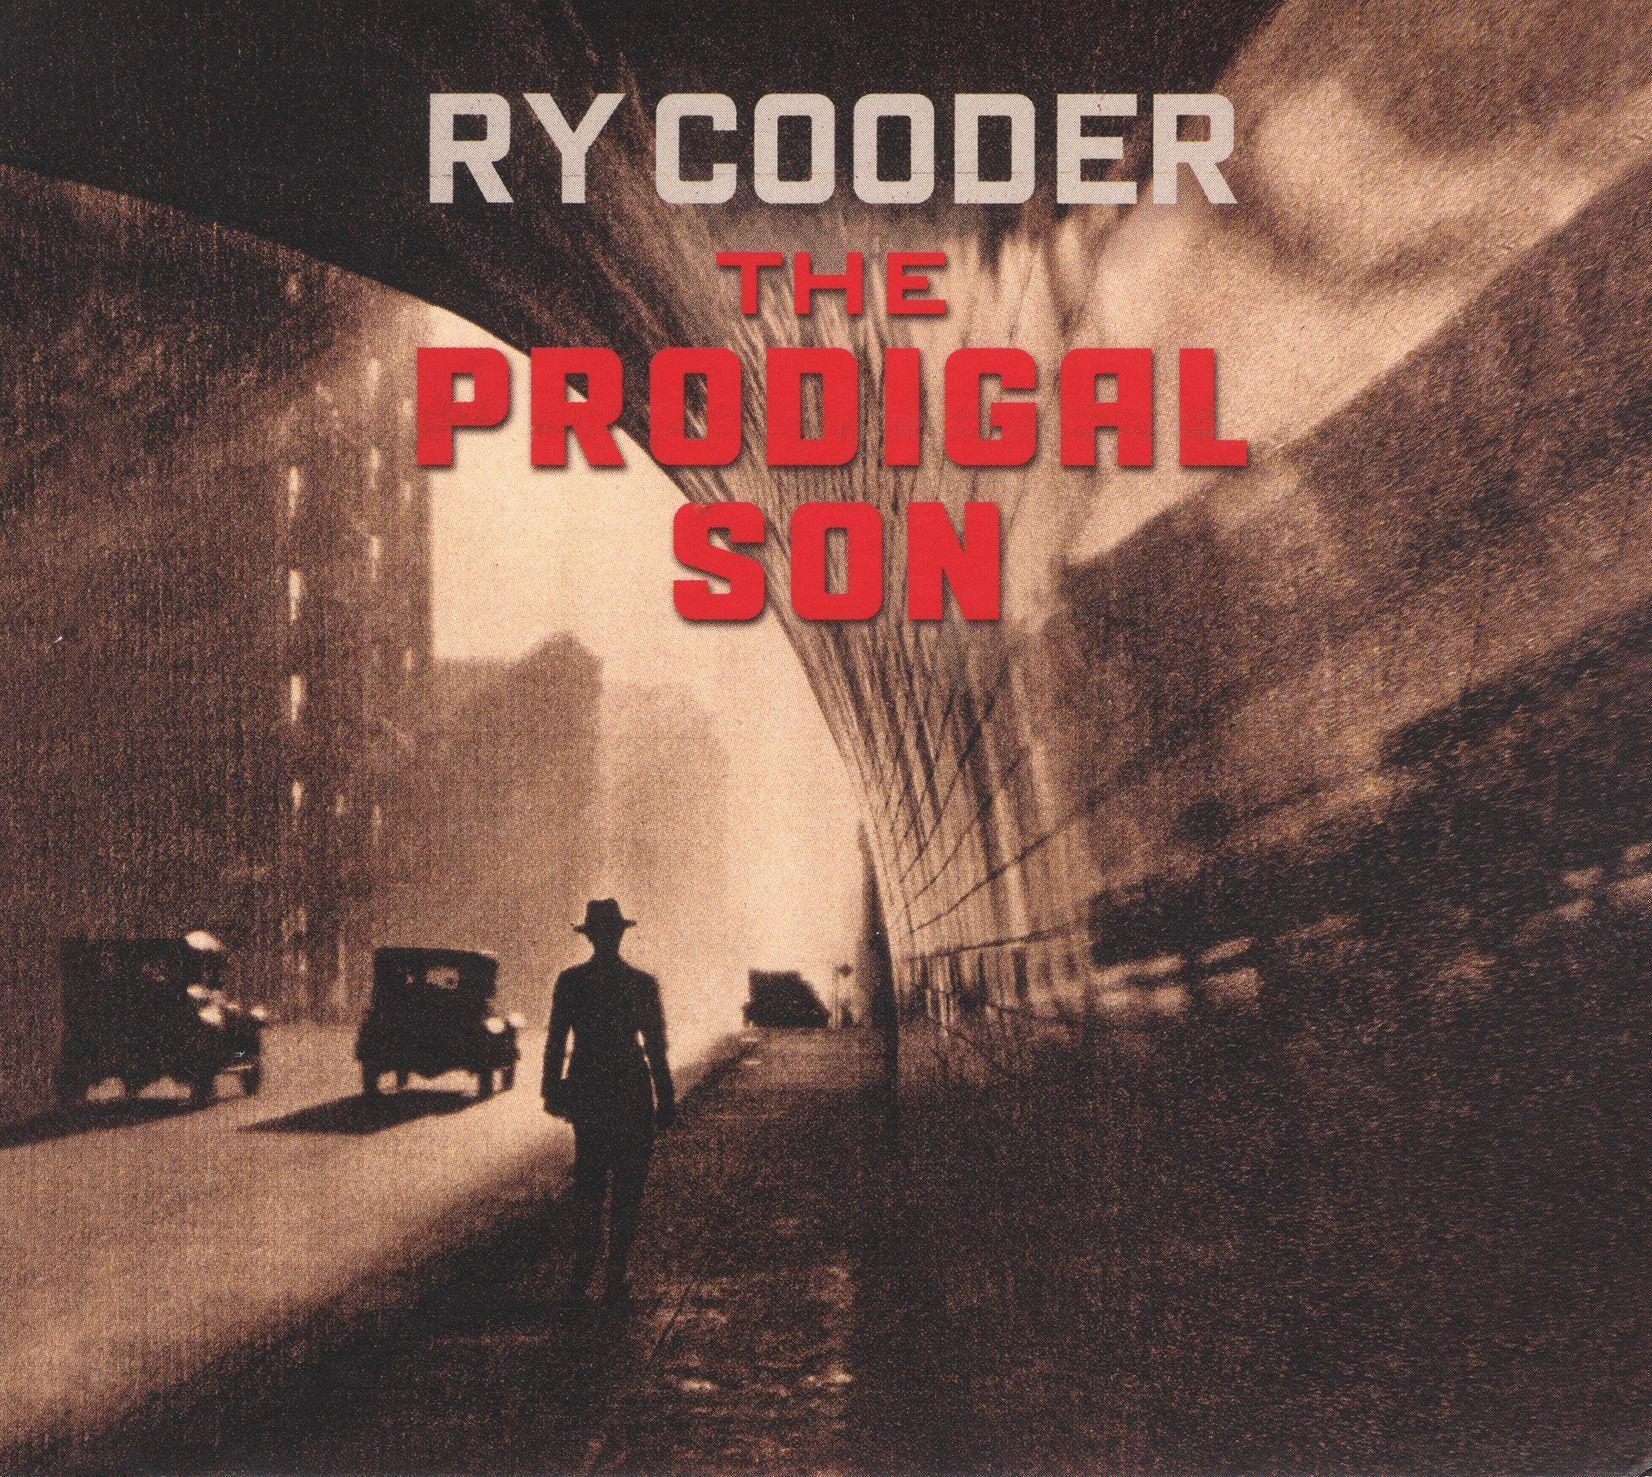 Ry Cooder - The Prodigal Son album cover